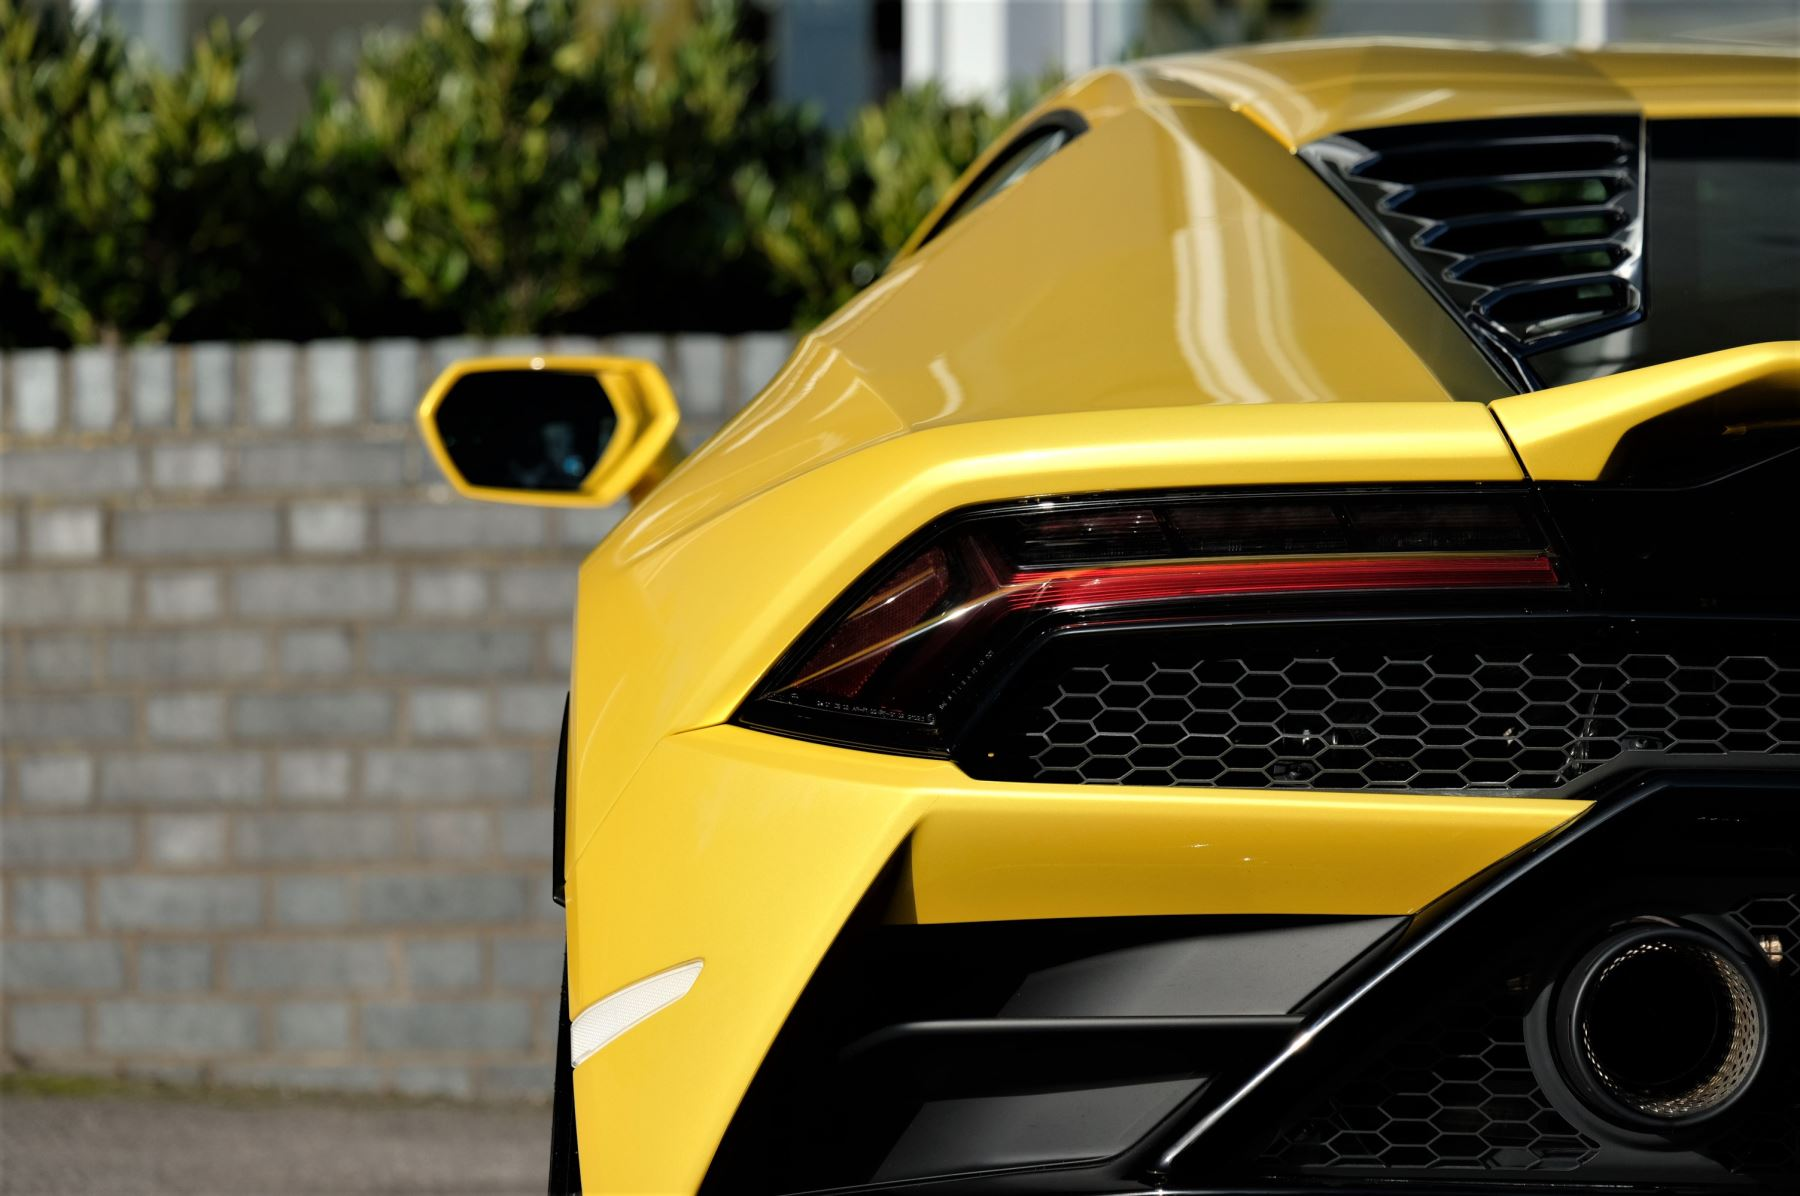 Lamborghini Huracan EVO 5.2 V10 610 2dr Auto RWD image 11